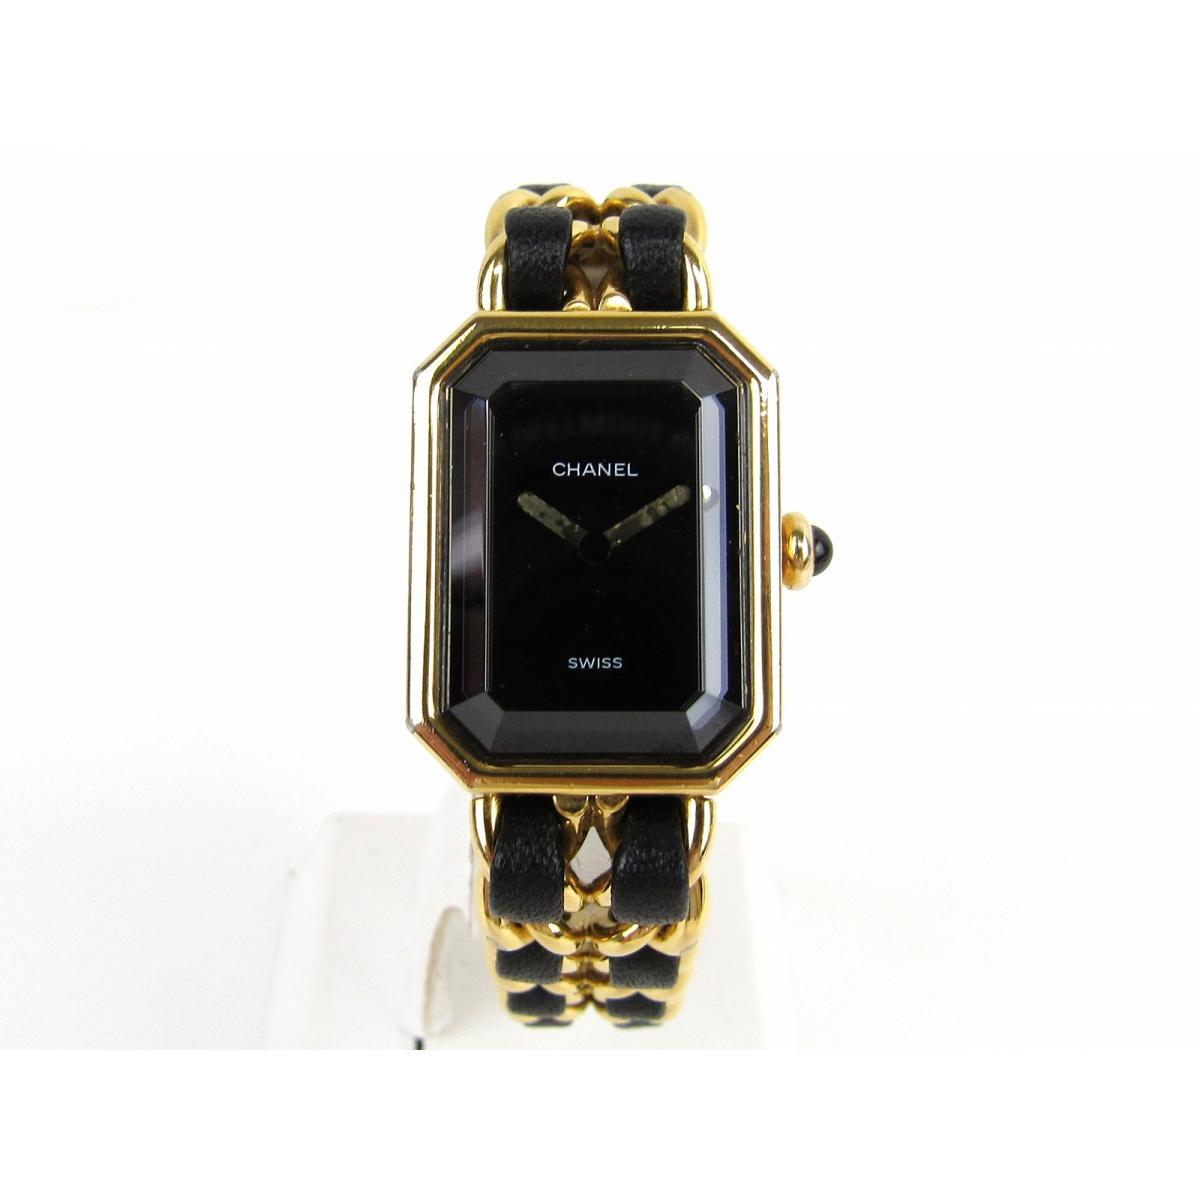 a65eee90e1 ... シャネルプルミエールMウォッチ腕時計レディースレザーベルトxGP(ゴールドメッキ)( ...